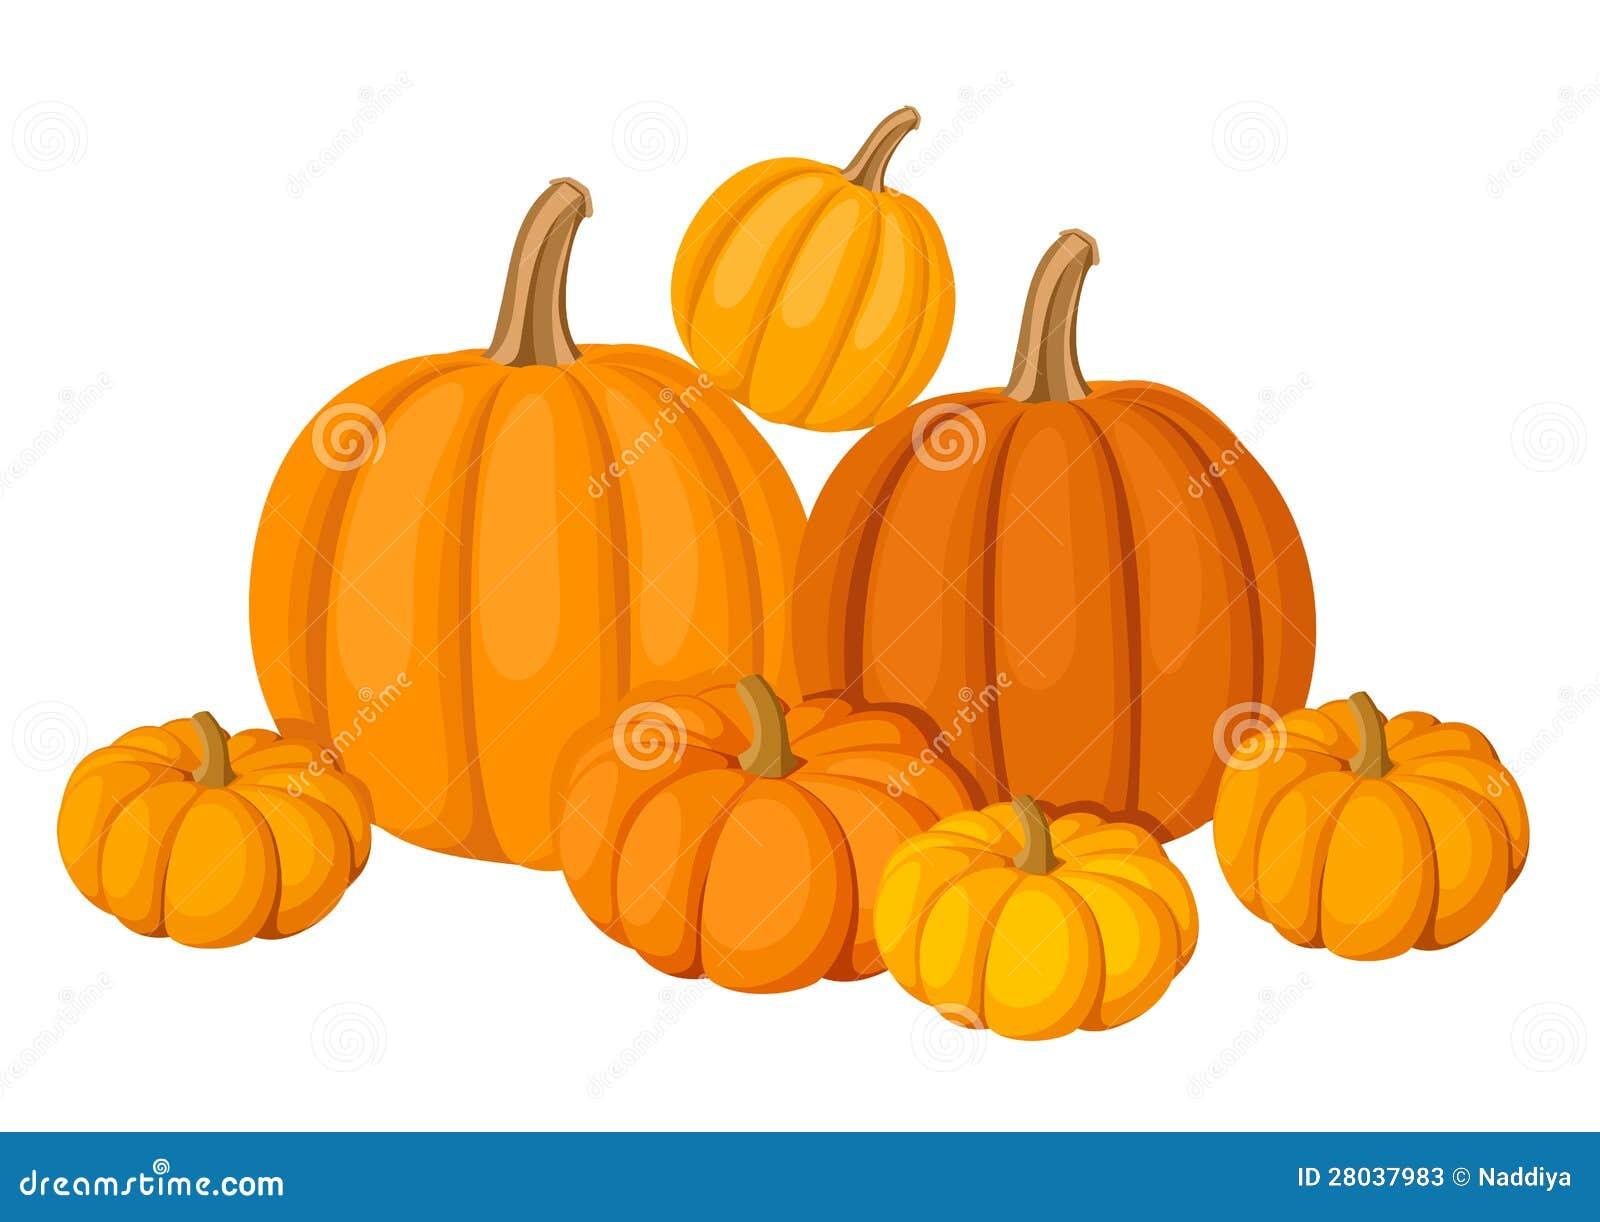 tourism business plan in bangladesh what do pumpkins